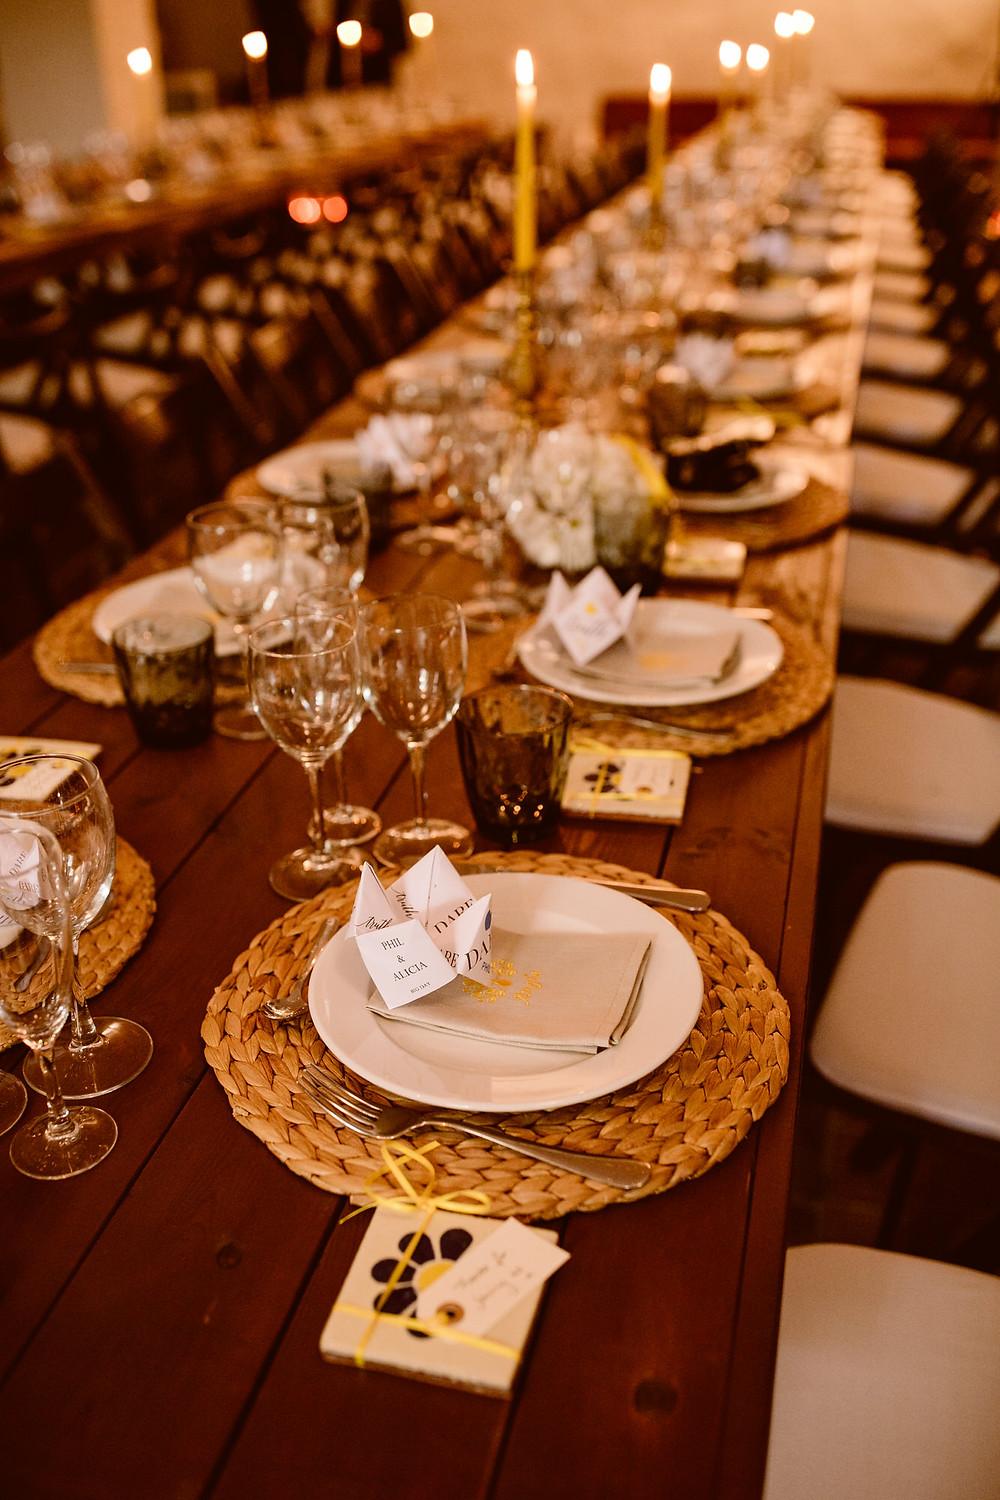 sibarum-catering-sitges-boda-wedding15